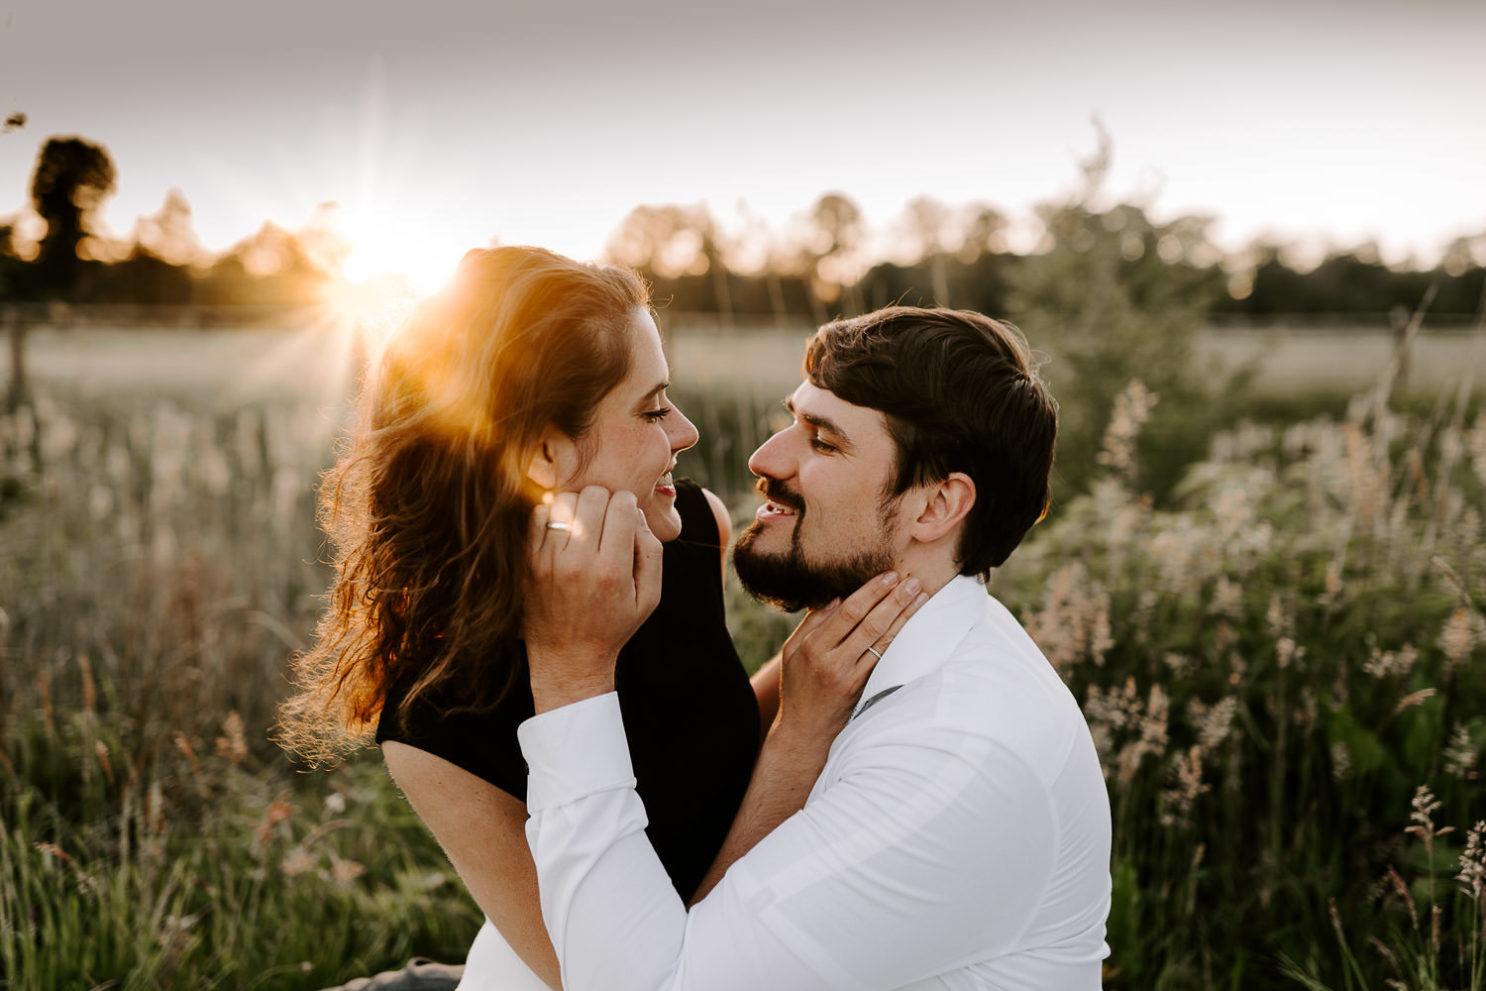 Verlobungsfoto im Sonnenuntergang in Bielefeld